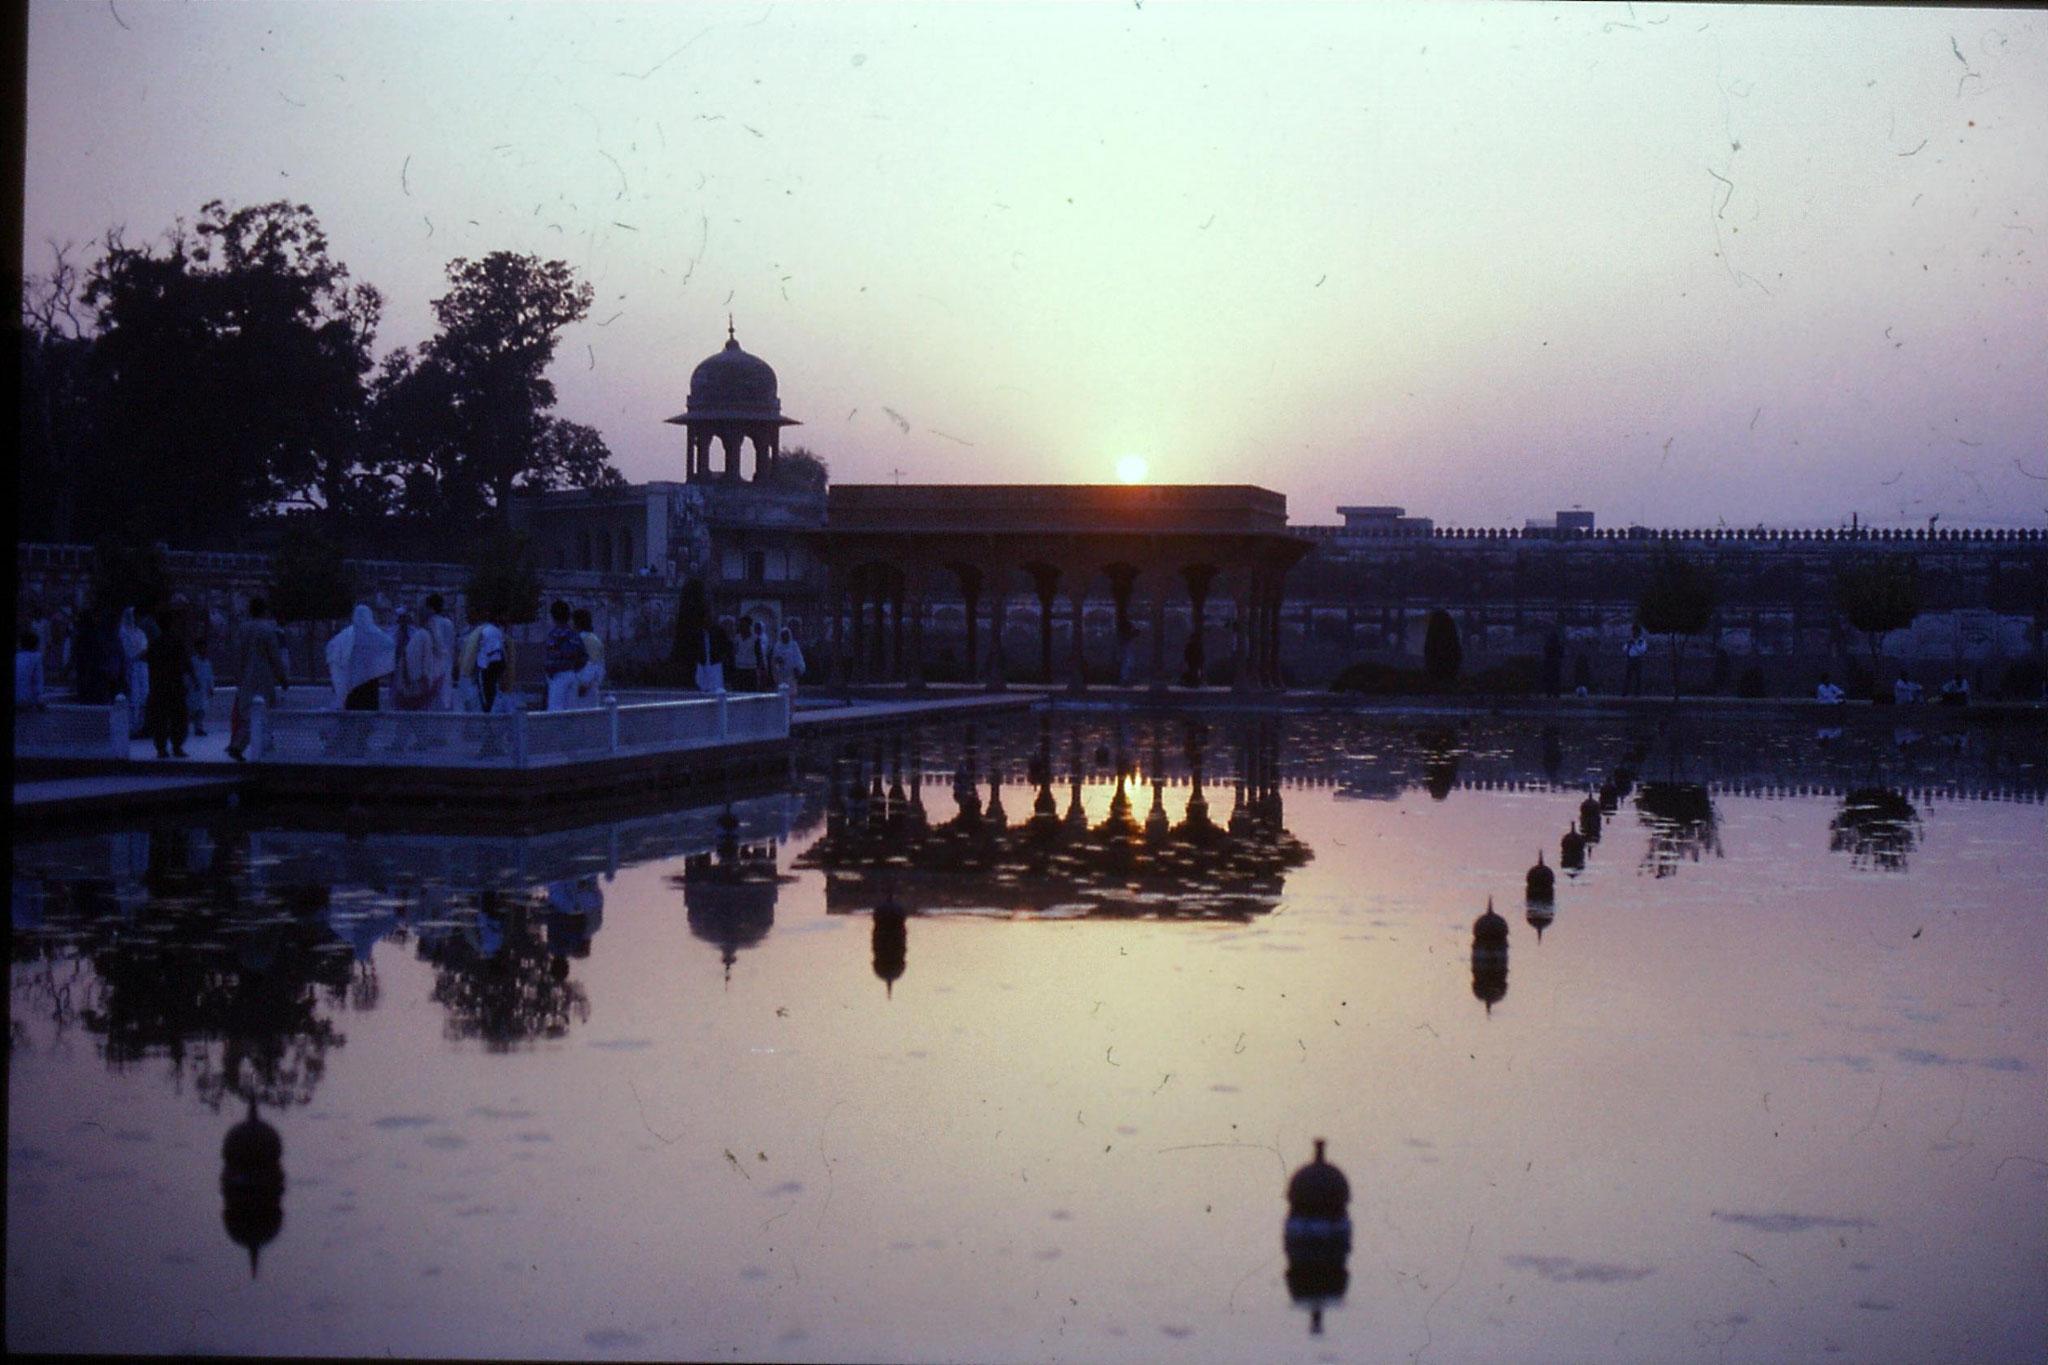 10/11/1989: 6: Lahore, Shalimar gardens